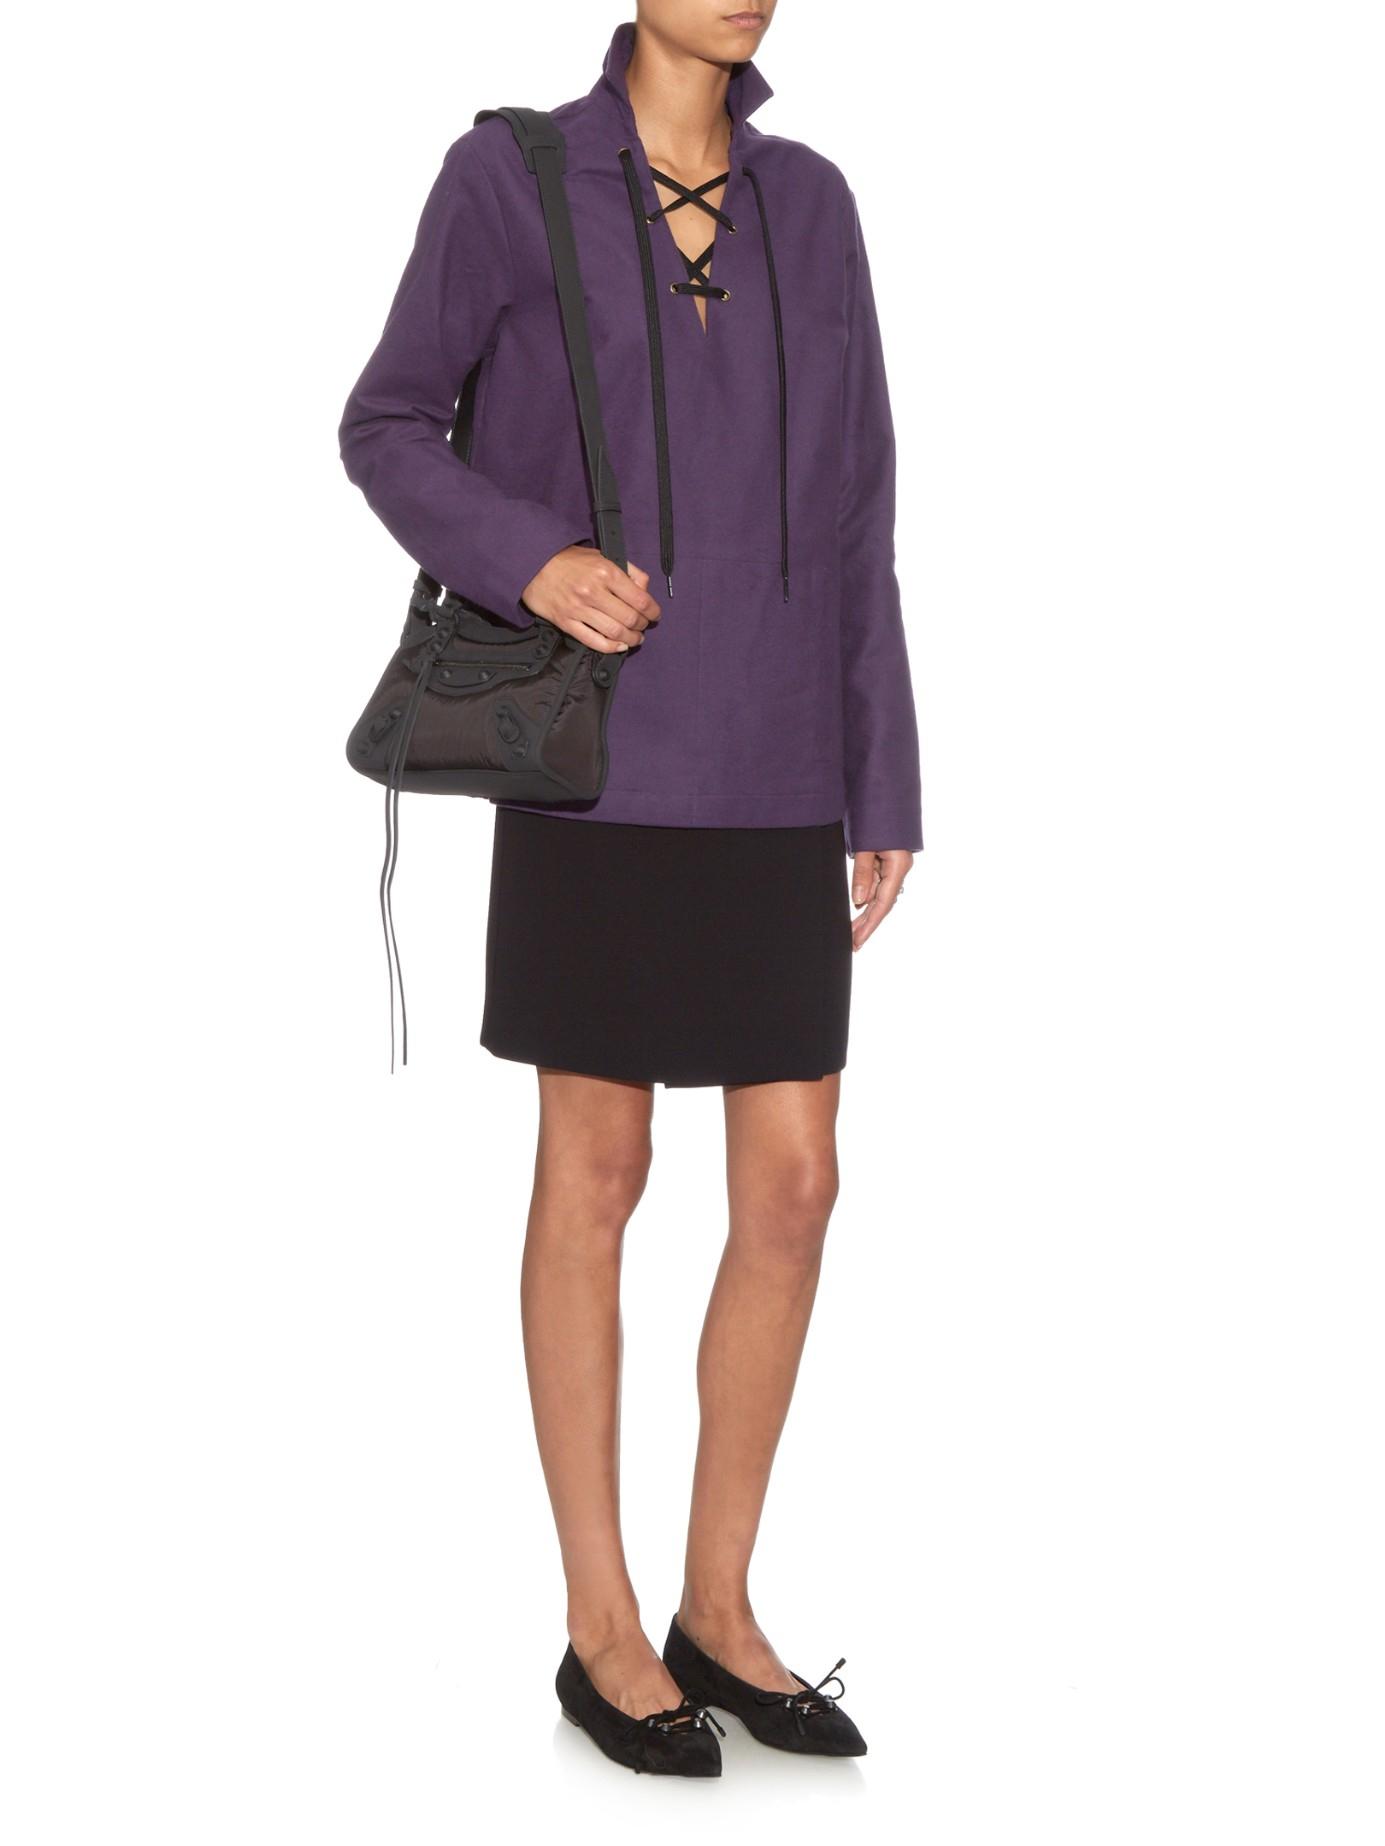 Balenciaga Classic Mini City Nylon Cross Body Bag In Black